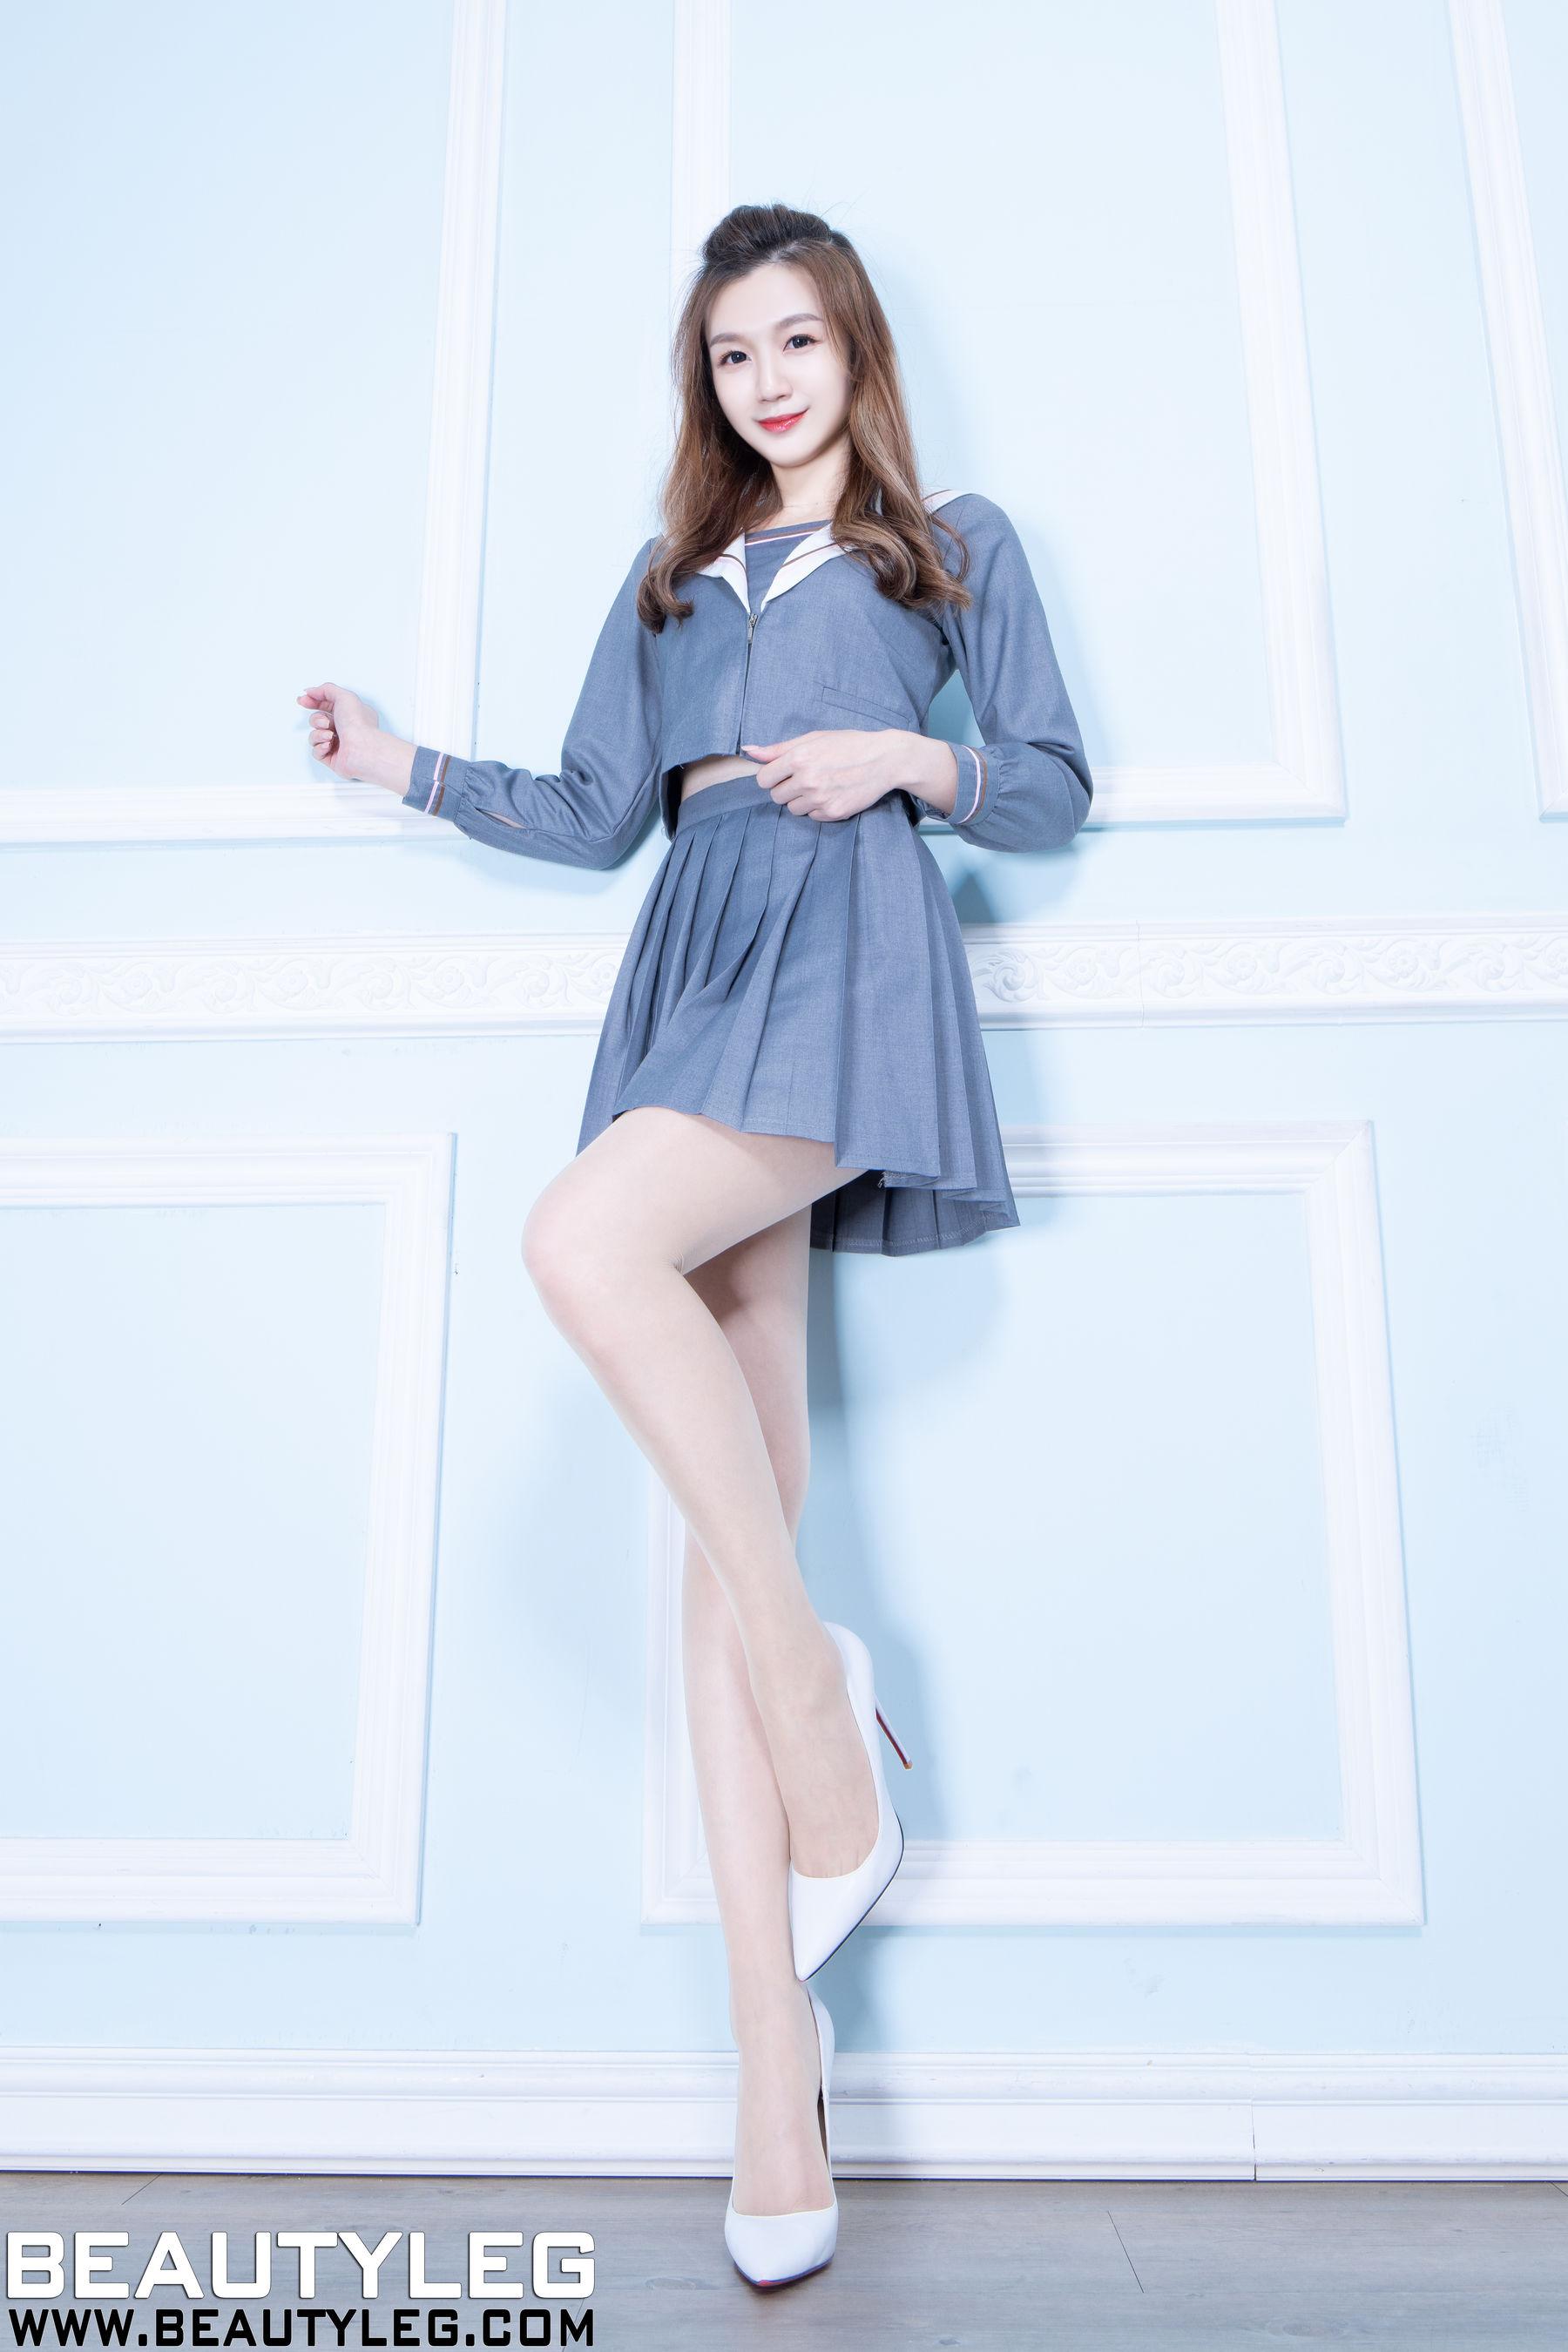 VOL.709 [Beautyleg]高跟长腿美女:腿模Sandra(Beautyleg Sandra)超高清个人性感漂亮大图(46P)